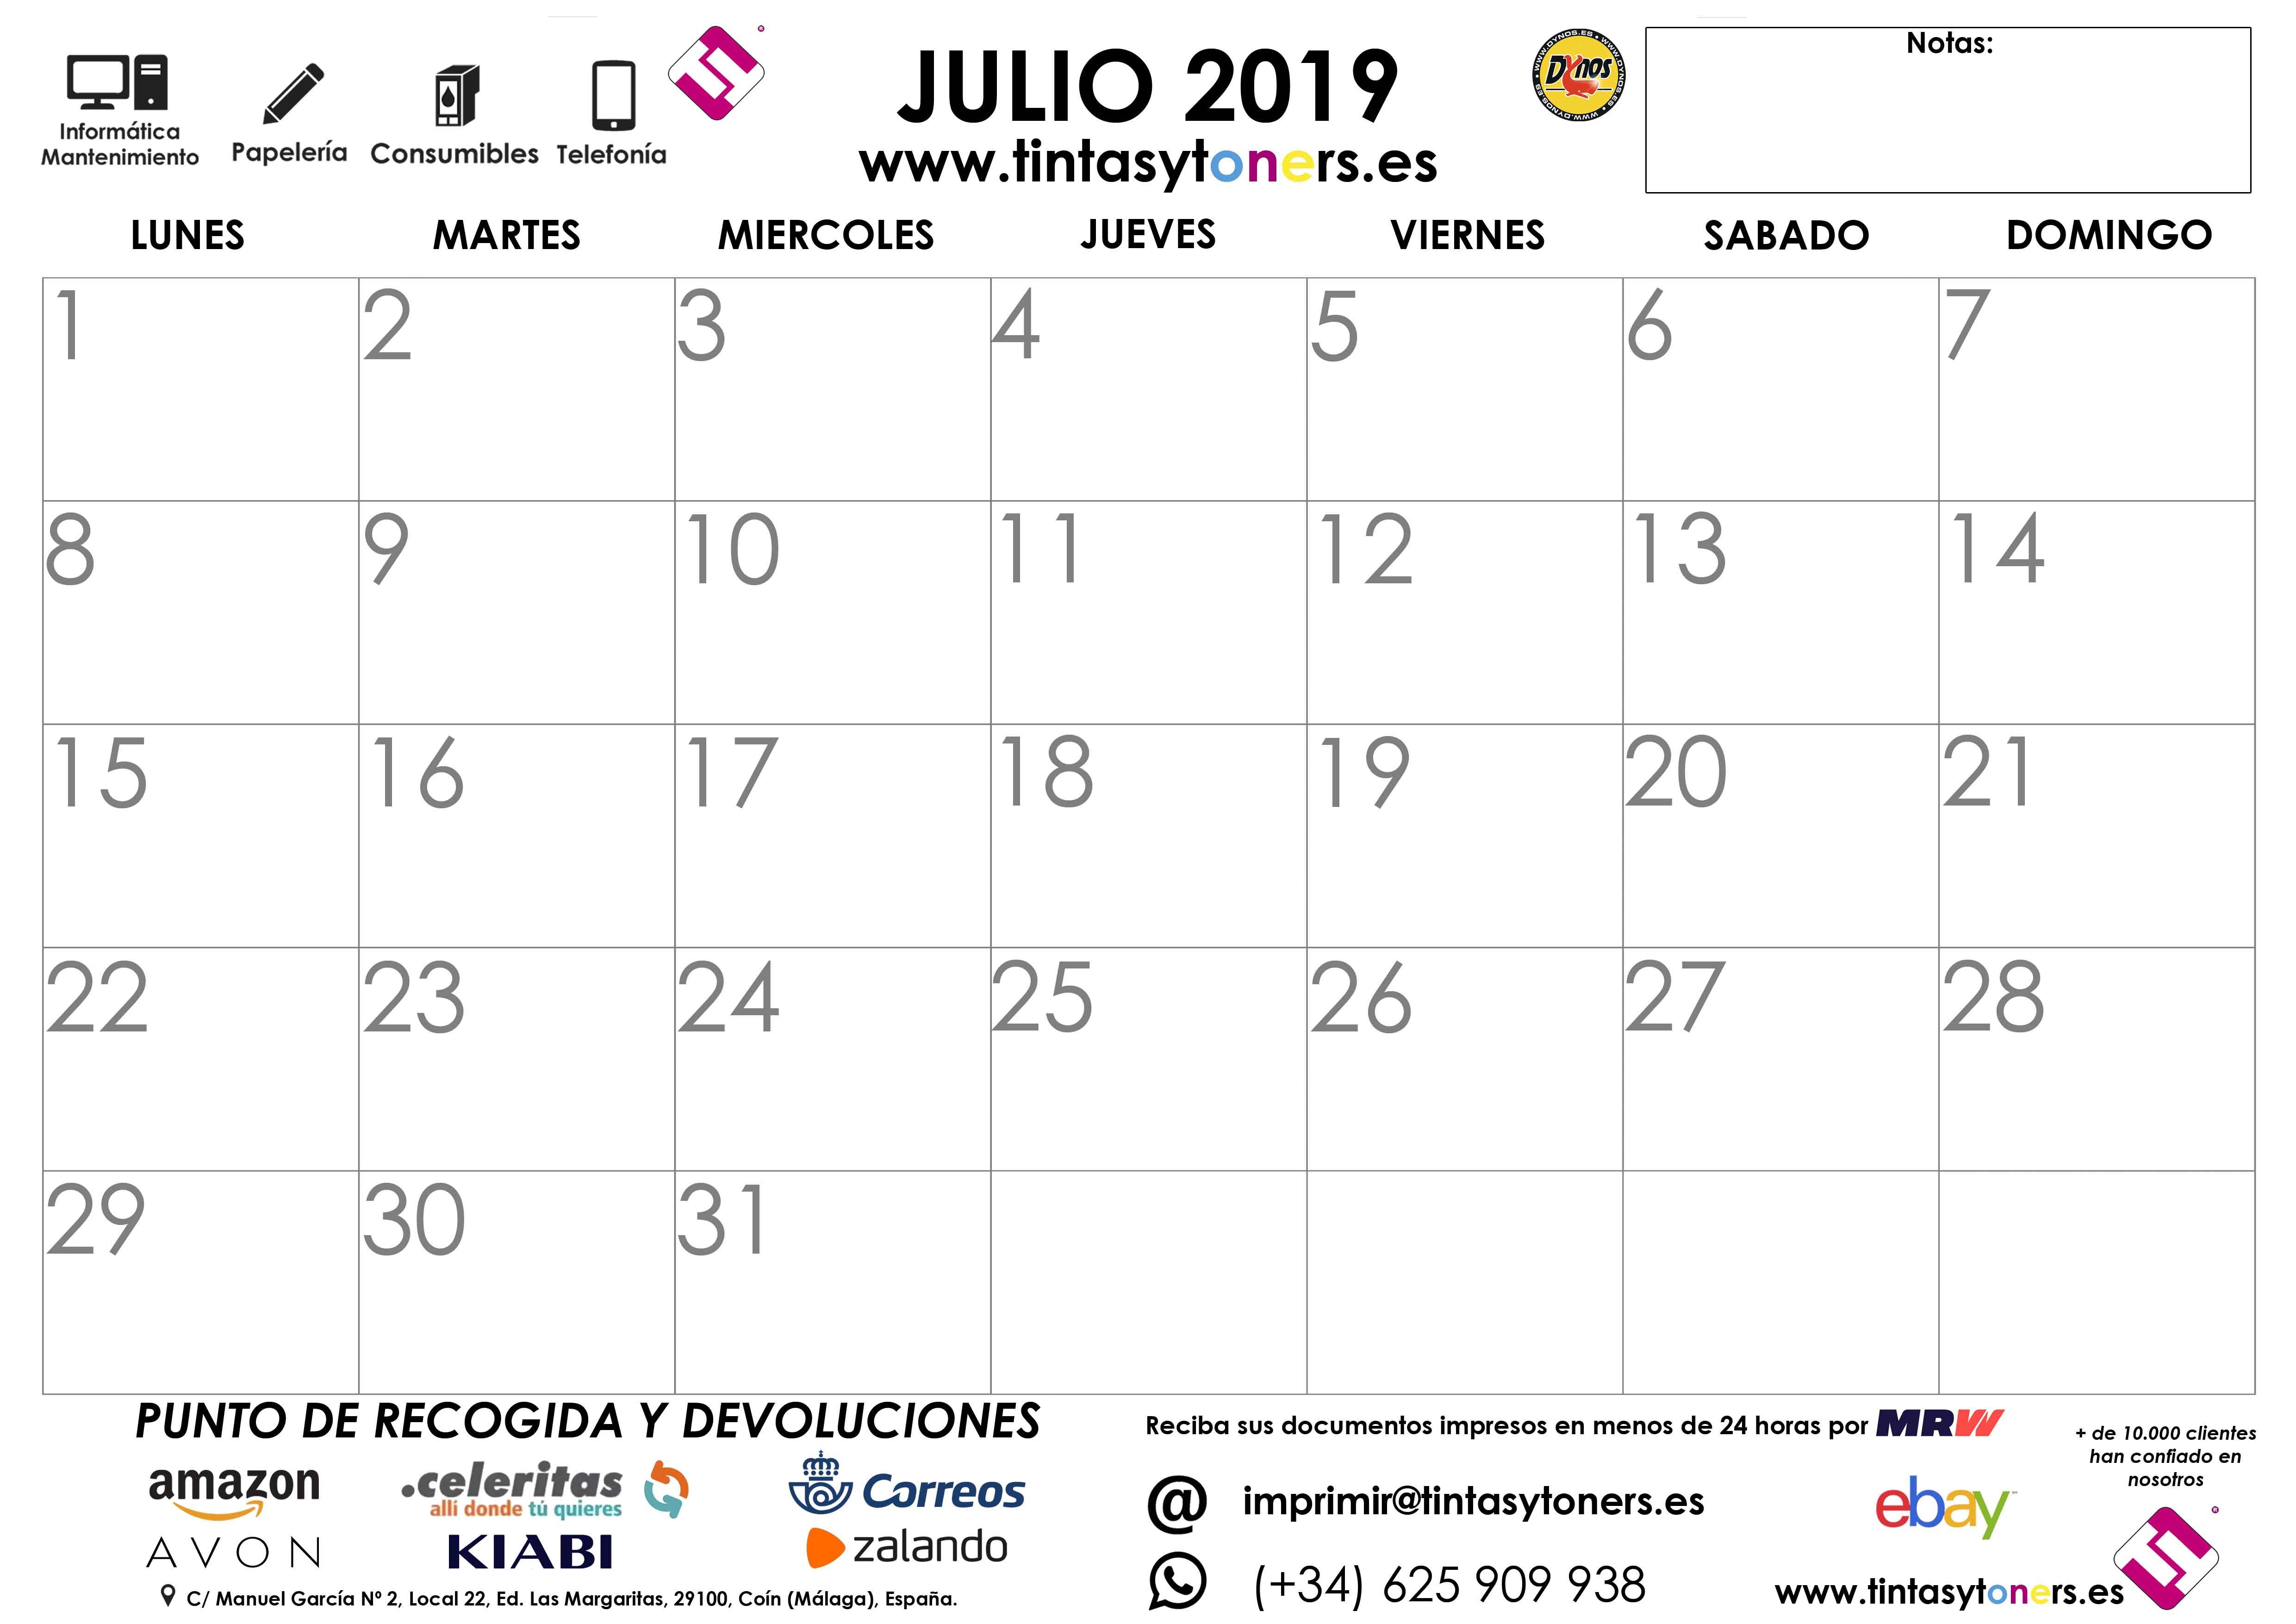 7 JULIO 2019 CALENDARIO TINTASYTONERS